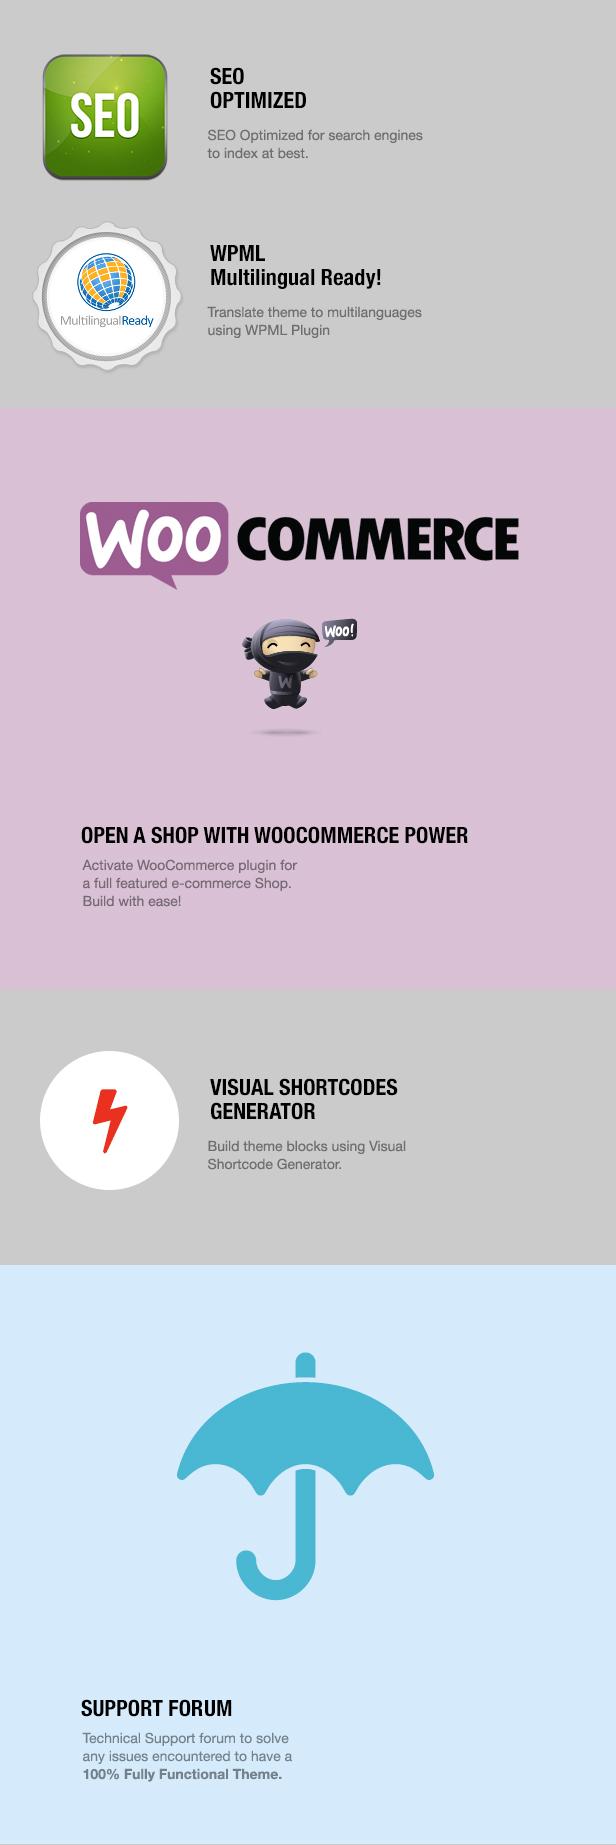 Darkroom - Fullscreen Studio for WordPress - 4